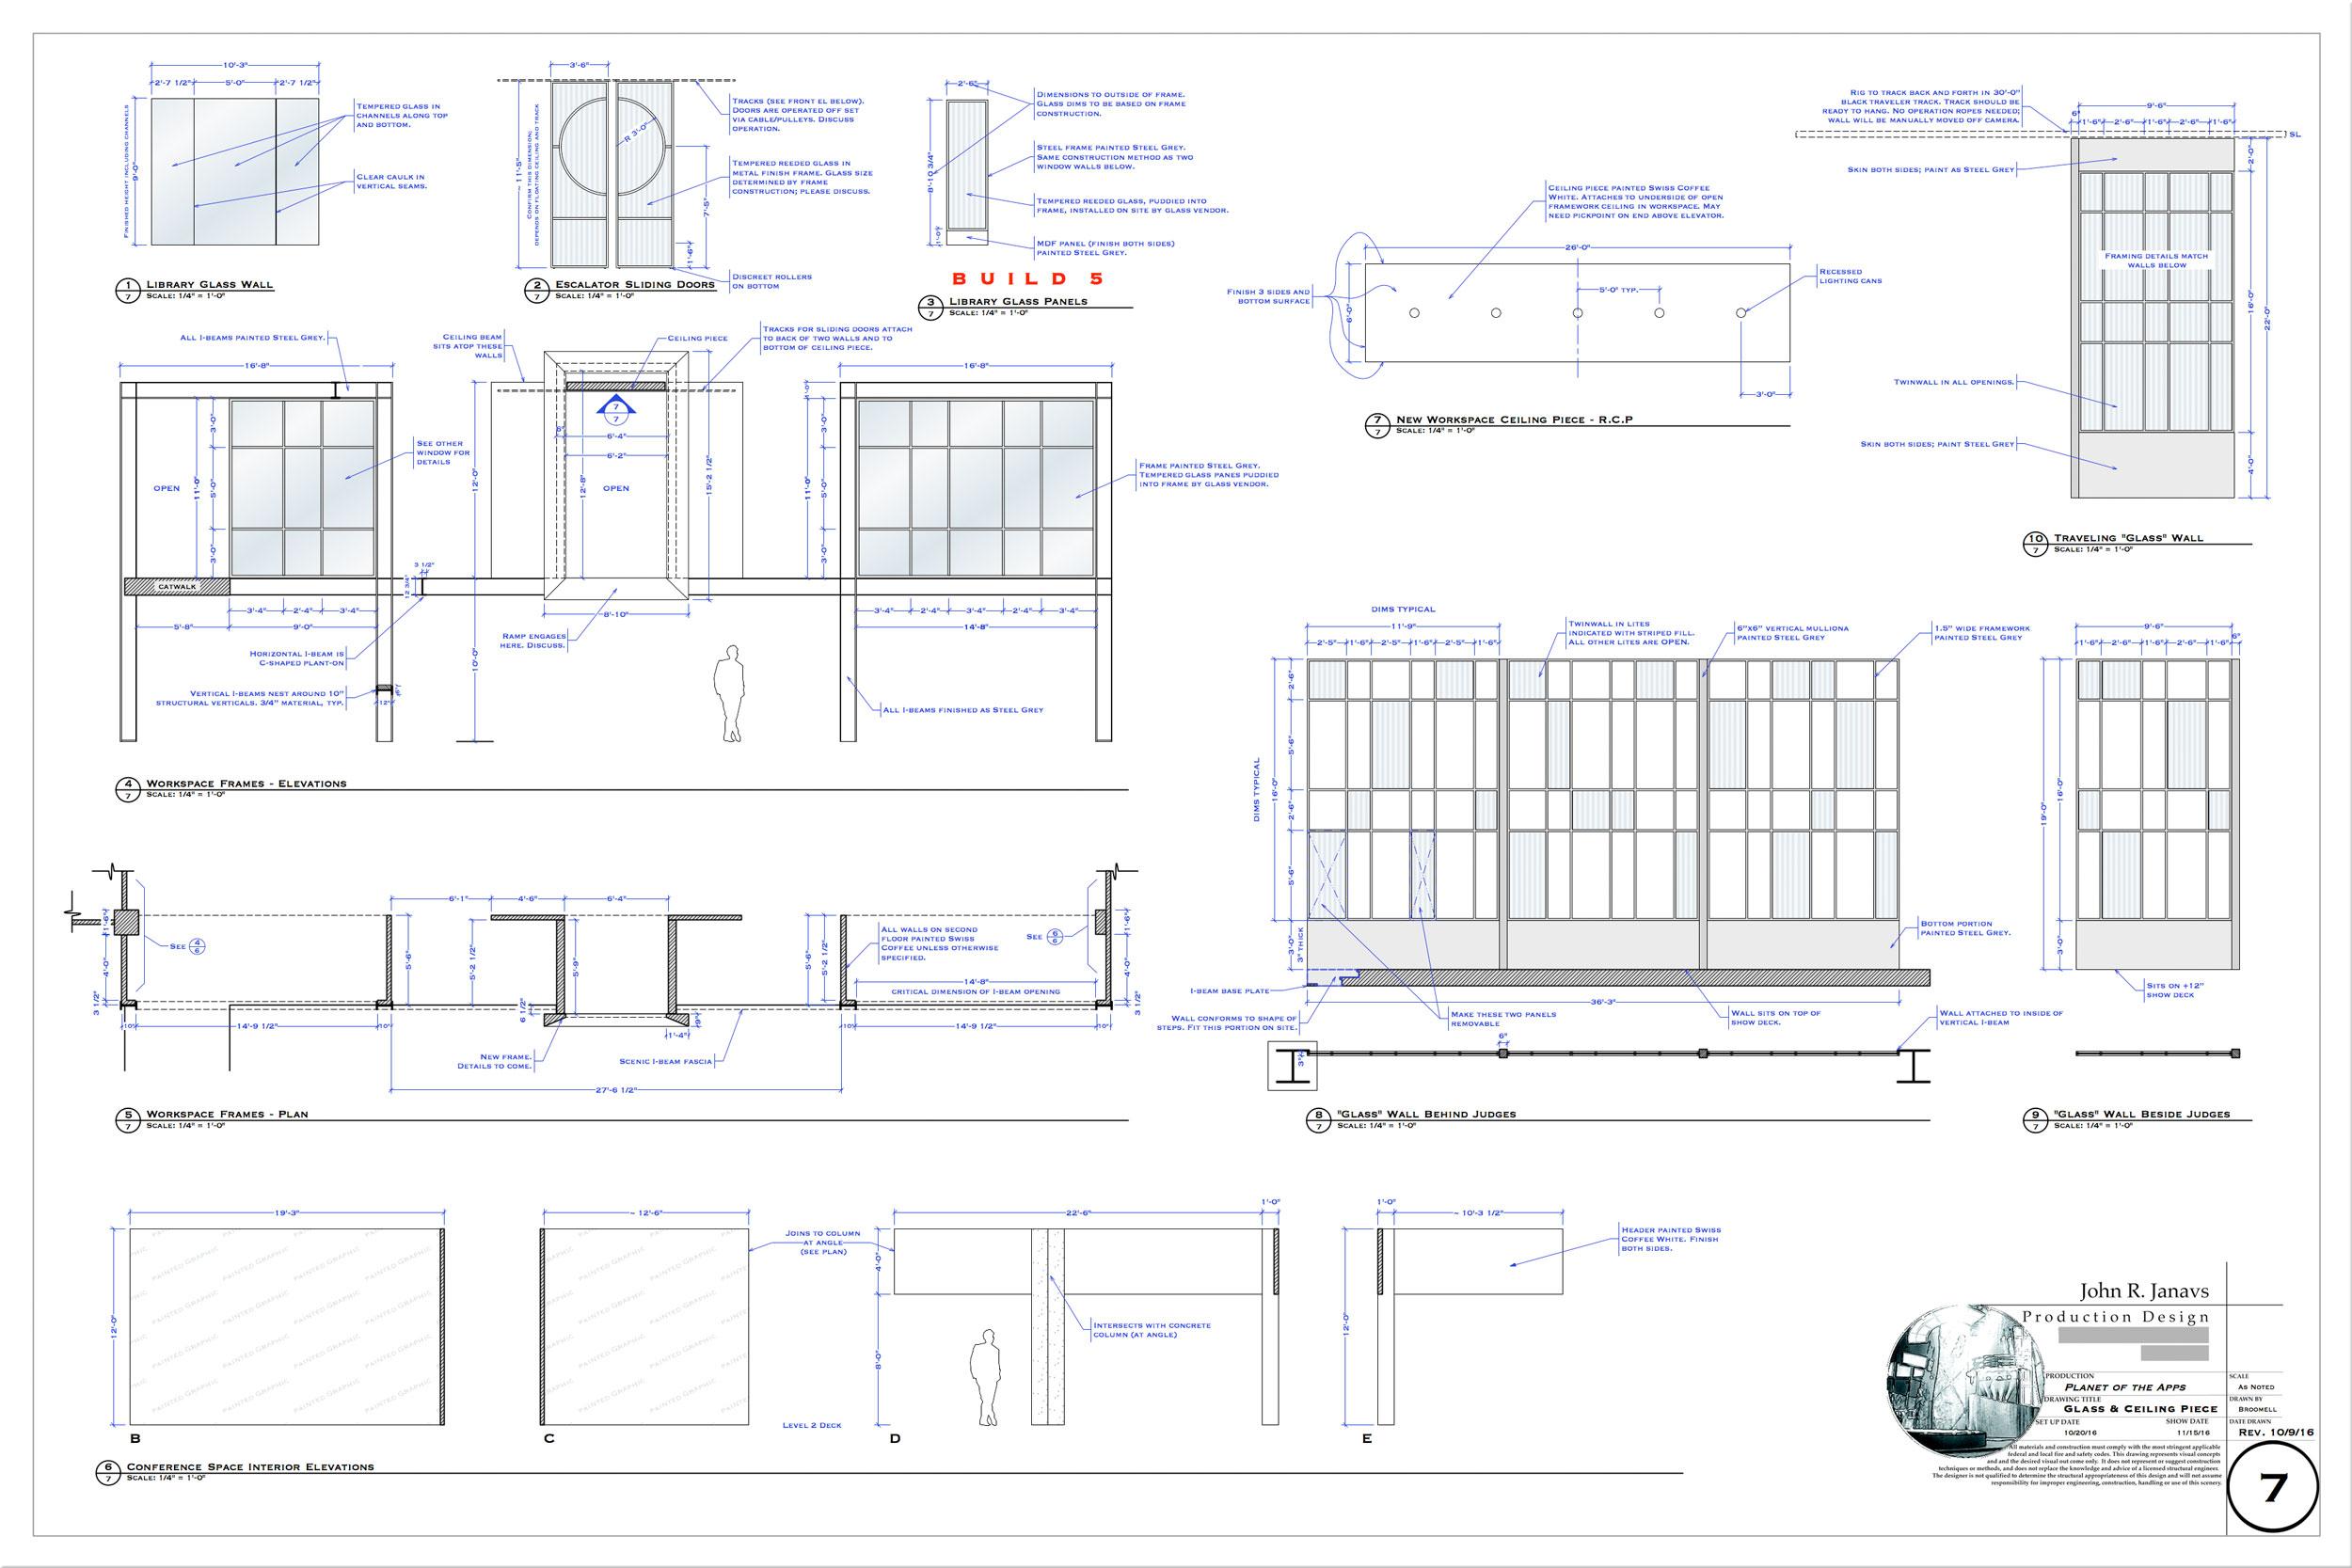 andy-broomell-set-design-drafting-pota2.jpg